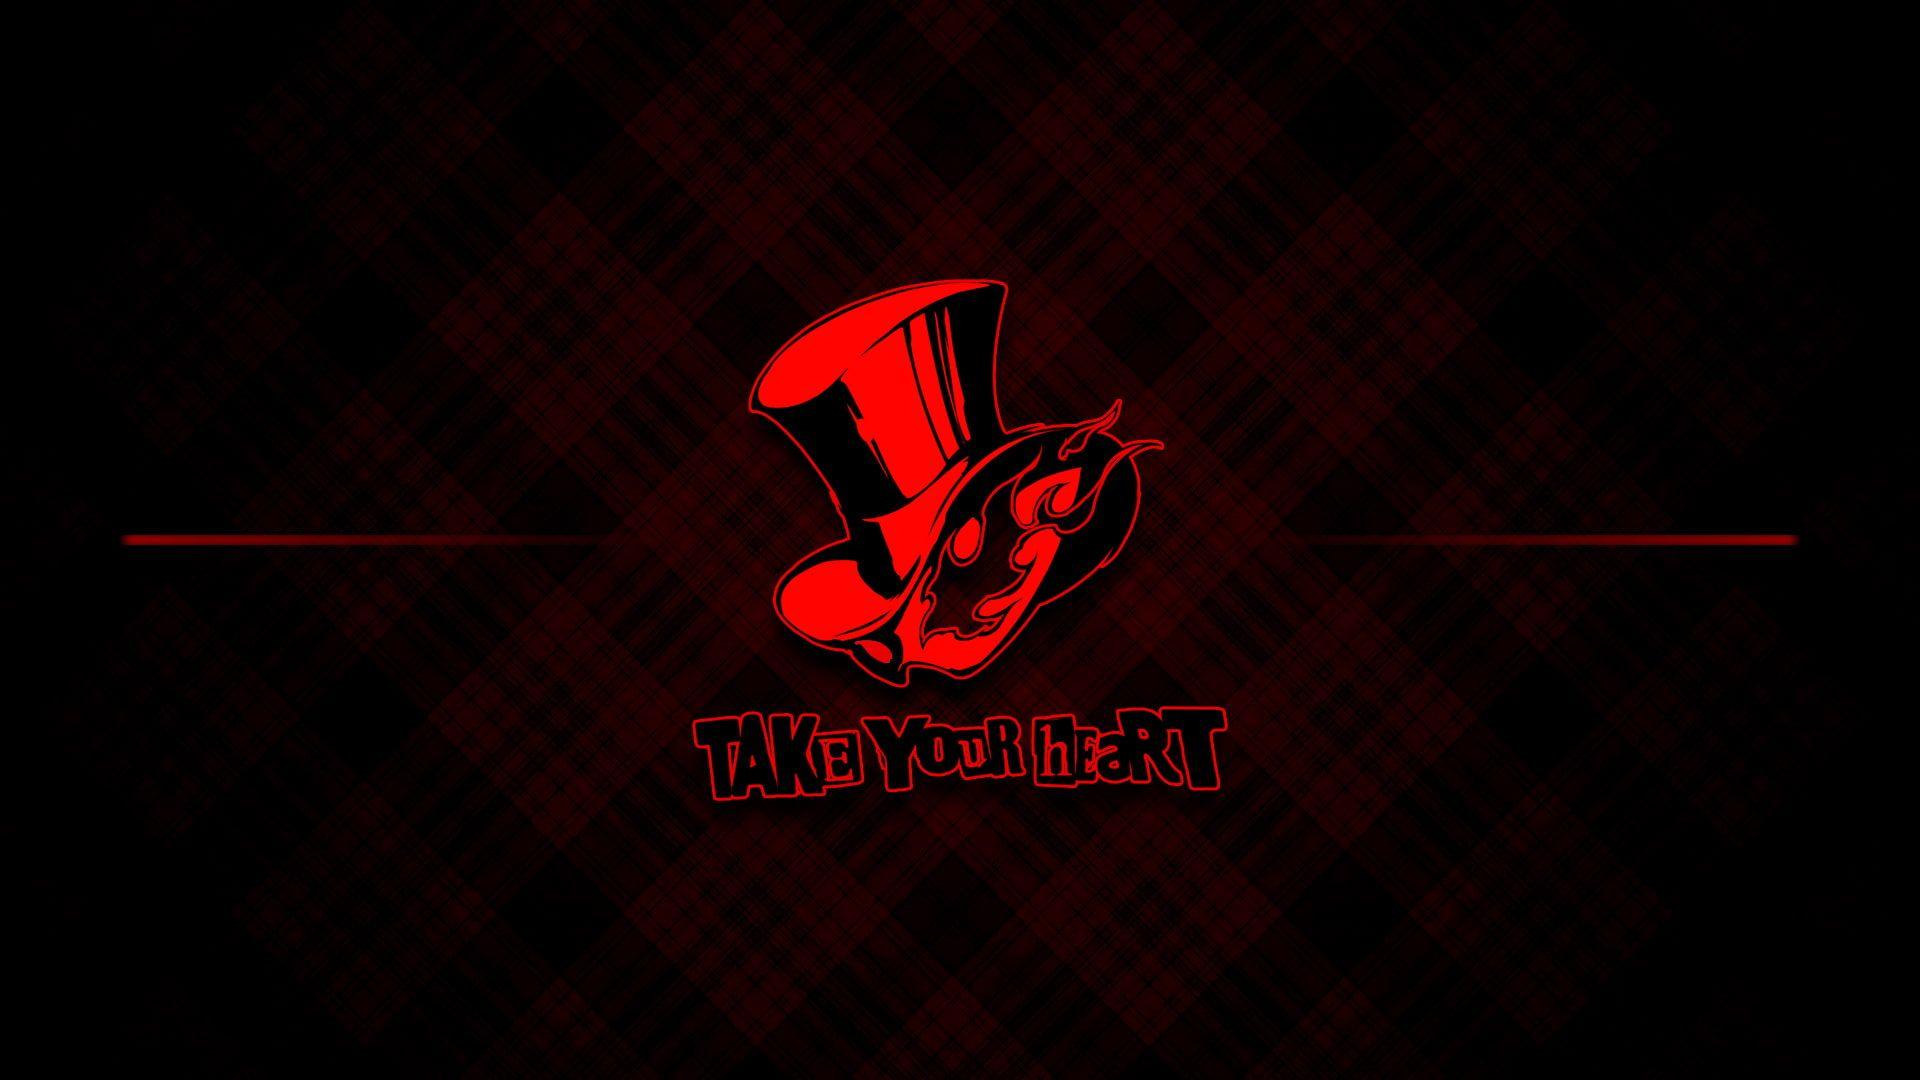 Persona 5 Red Abstract 1080p Wallpaper Hdwallpaper Desktop Persona 5 Persona 5 Joker Persona